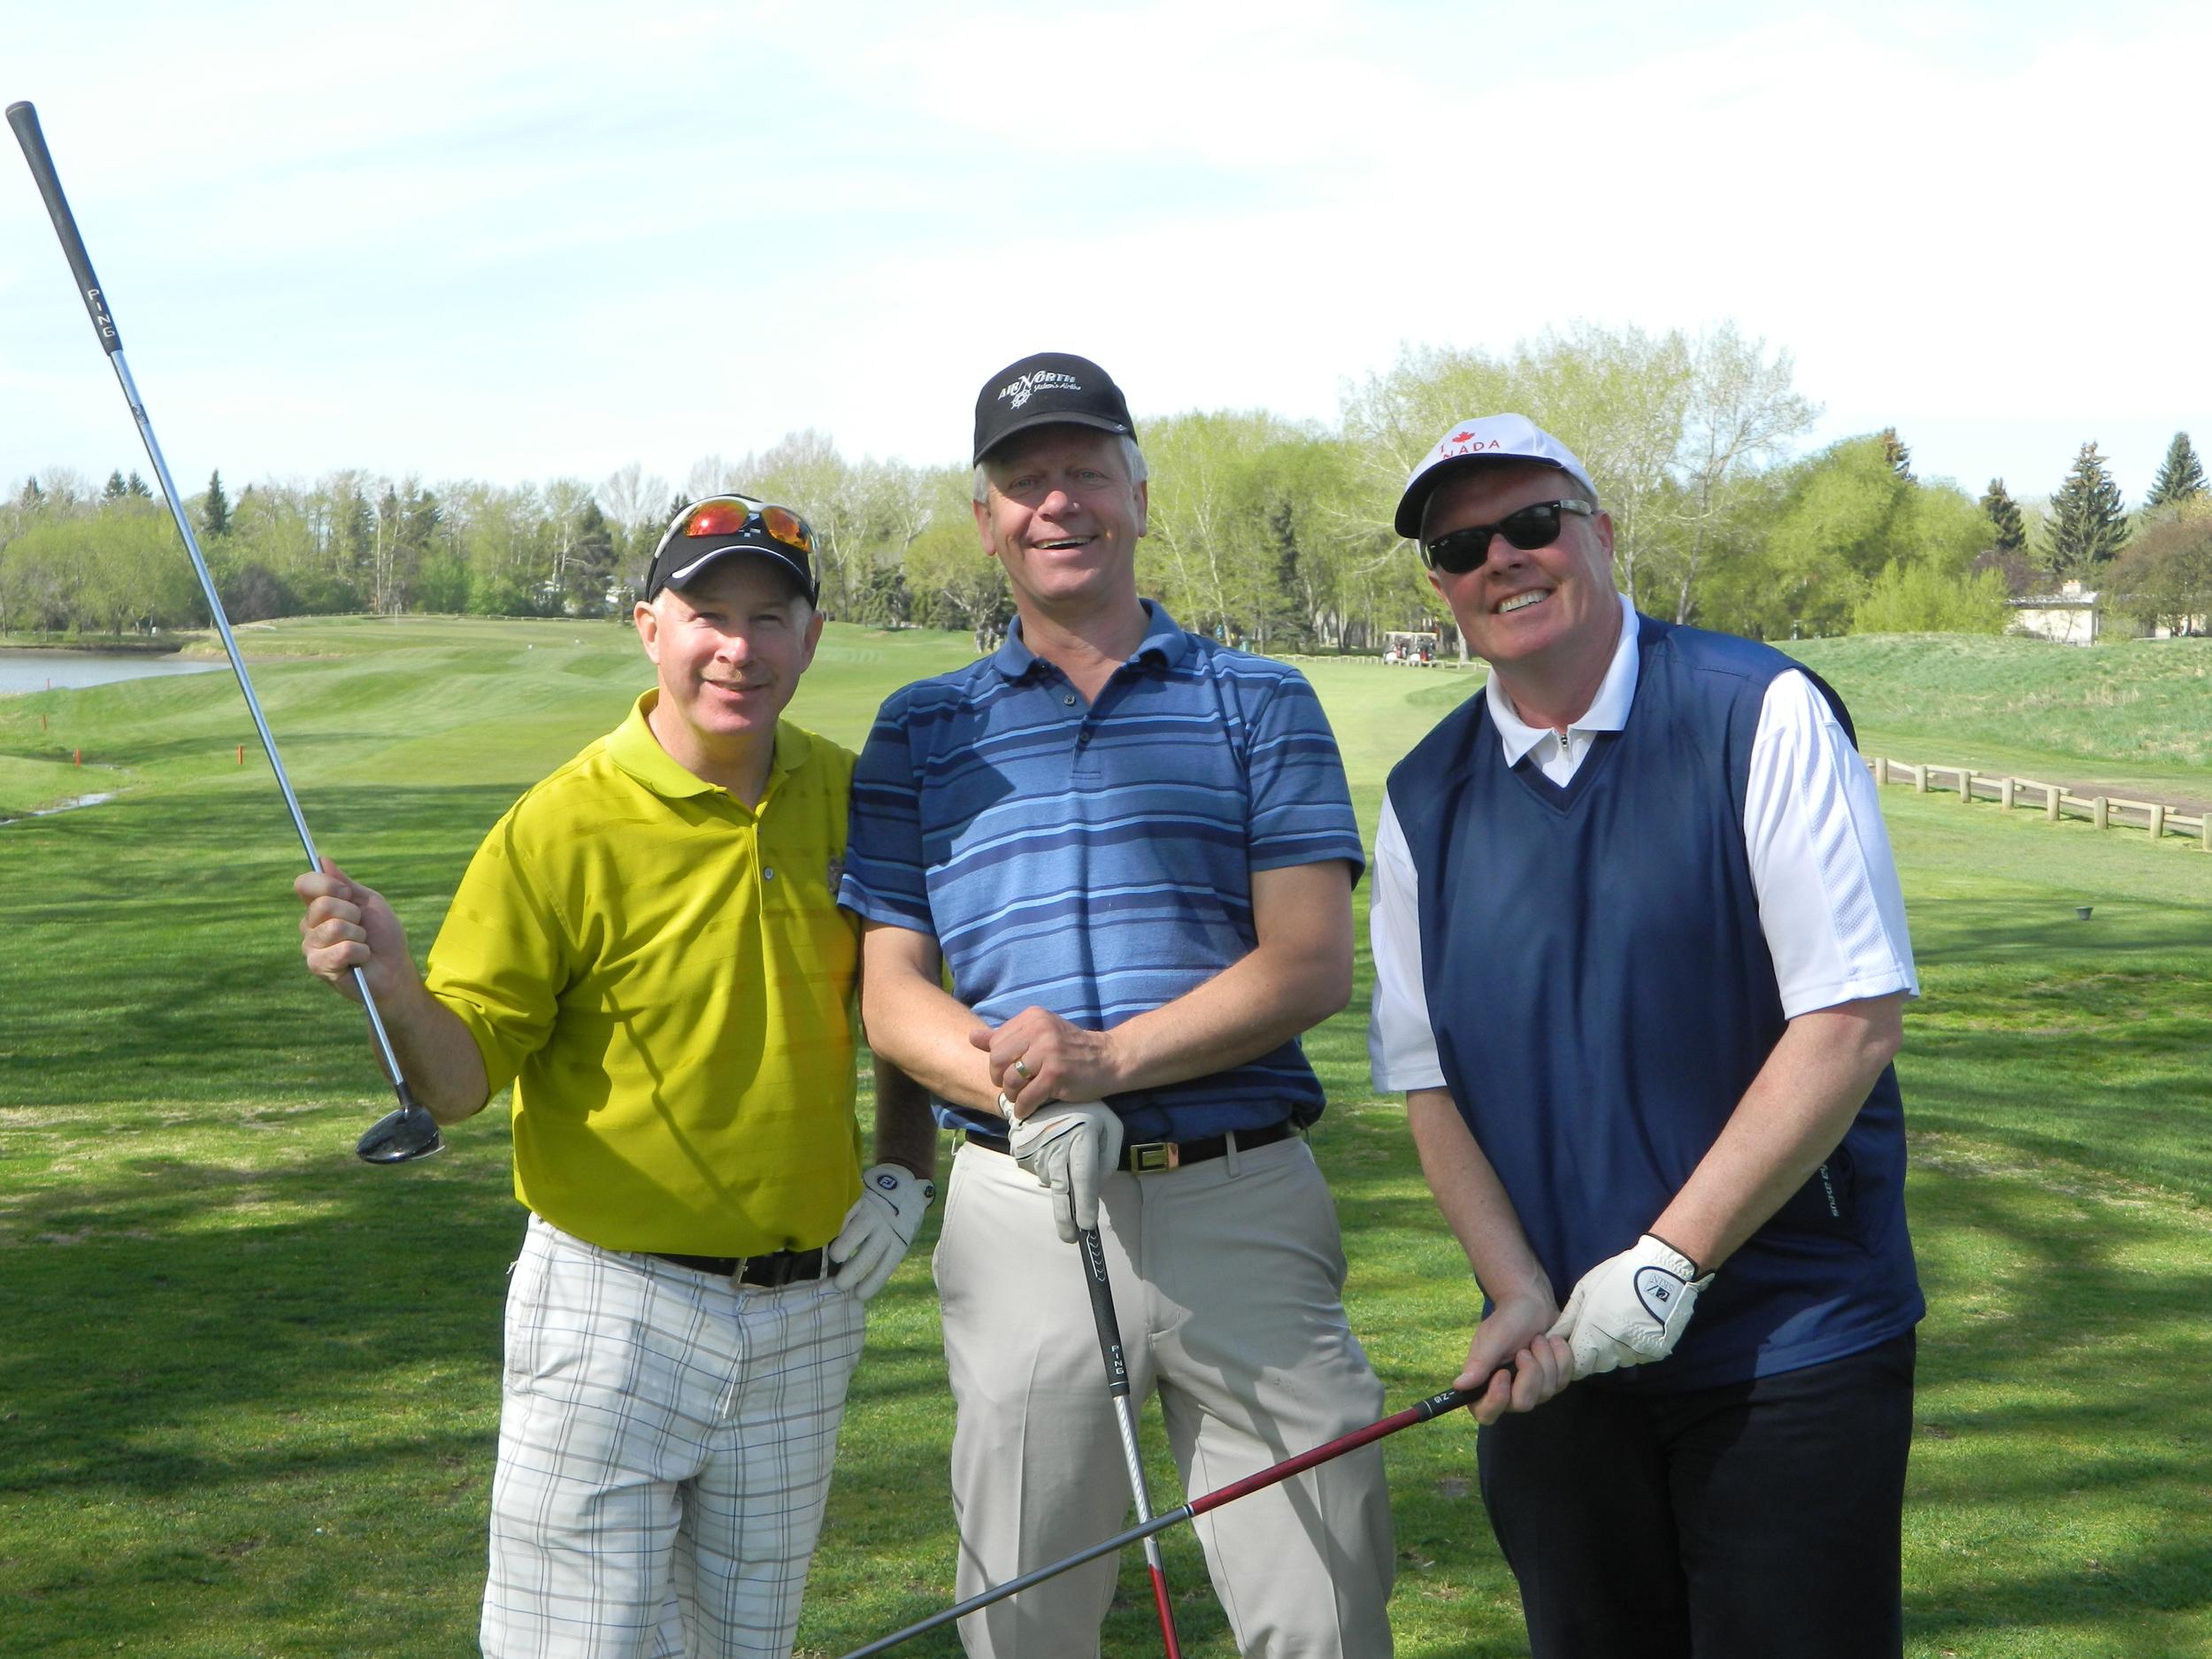 204 golfer pictures 019.jpg